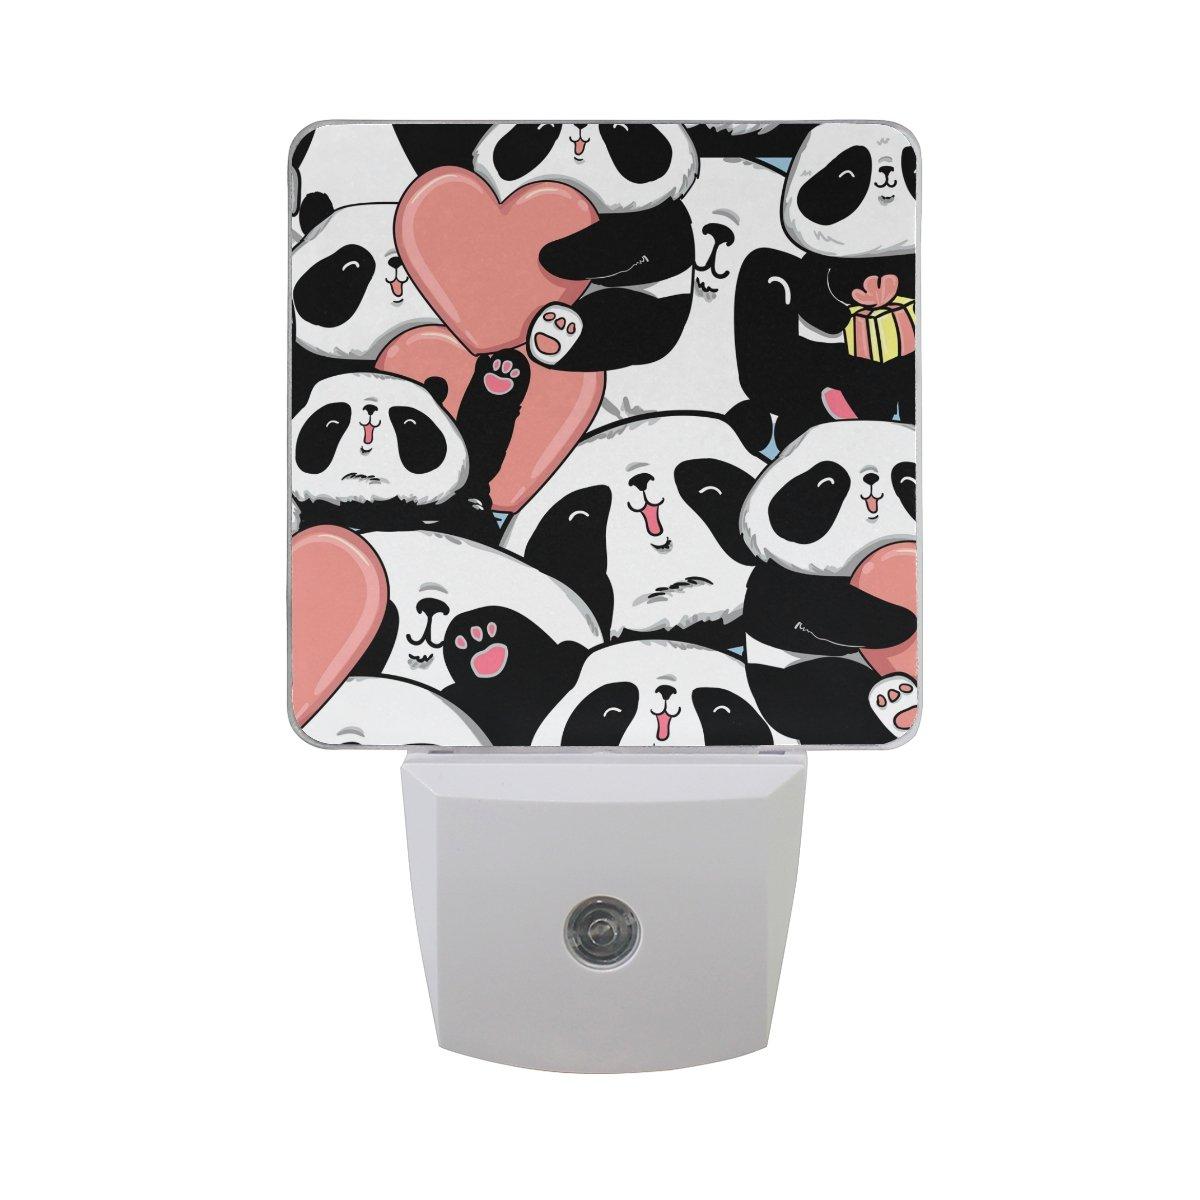 JOYPRINT Led Night Light Valentine's Day Panda Love Heart, Auto Senor Dusk to Dawn Night Light Plug in for Kids Baby Girls Boys Adults Room